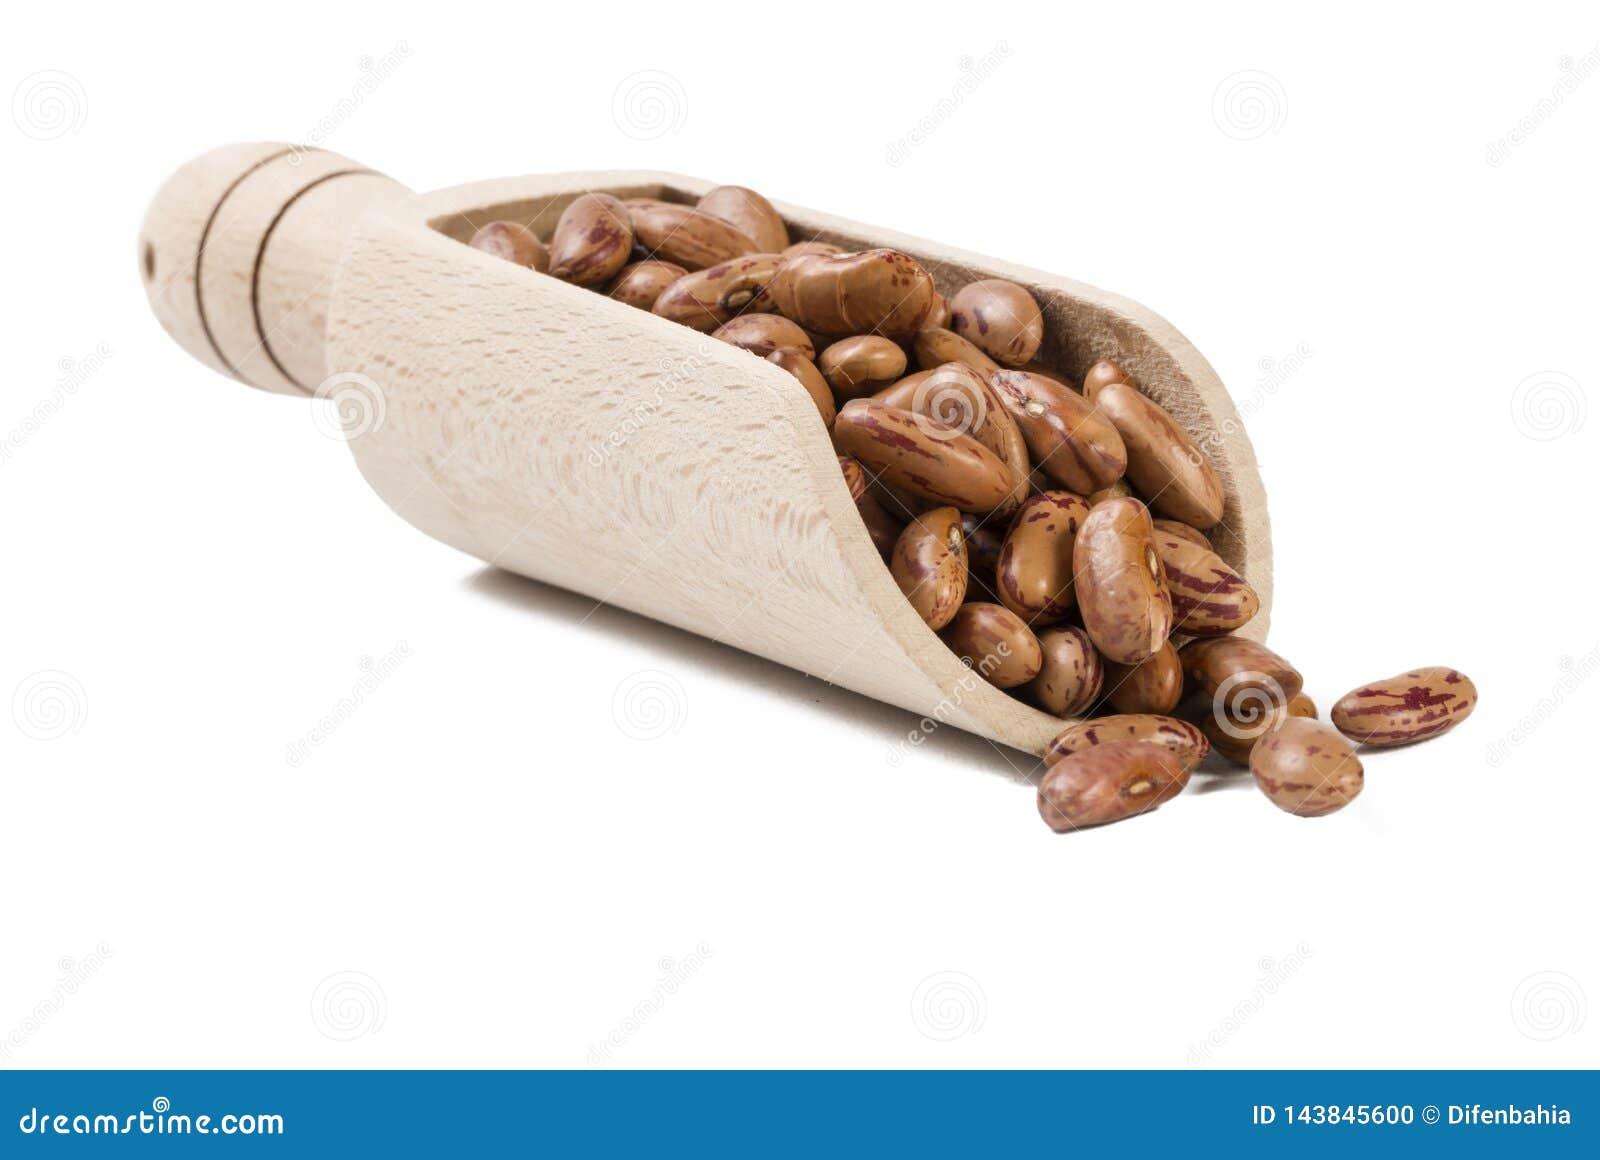 Pinto φασόλι στην ξύλινη σέσουλα που απομονώνεται στο άσπρο υπόβαθρο διατροφή βιο Φυσικό συστατικό τροφίμων